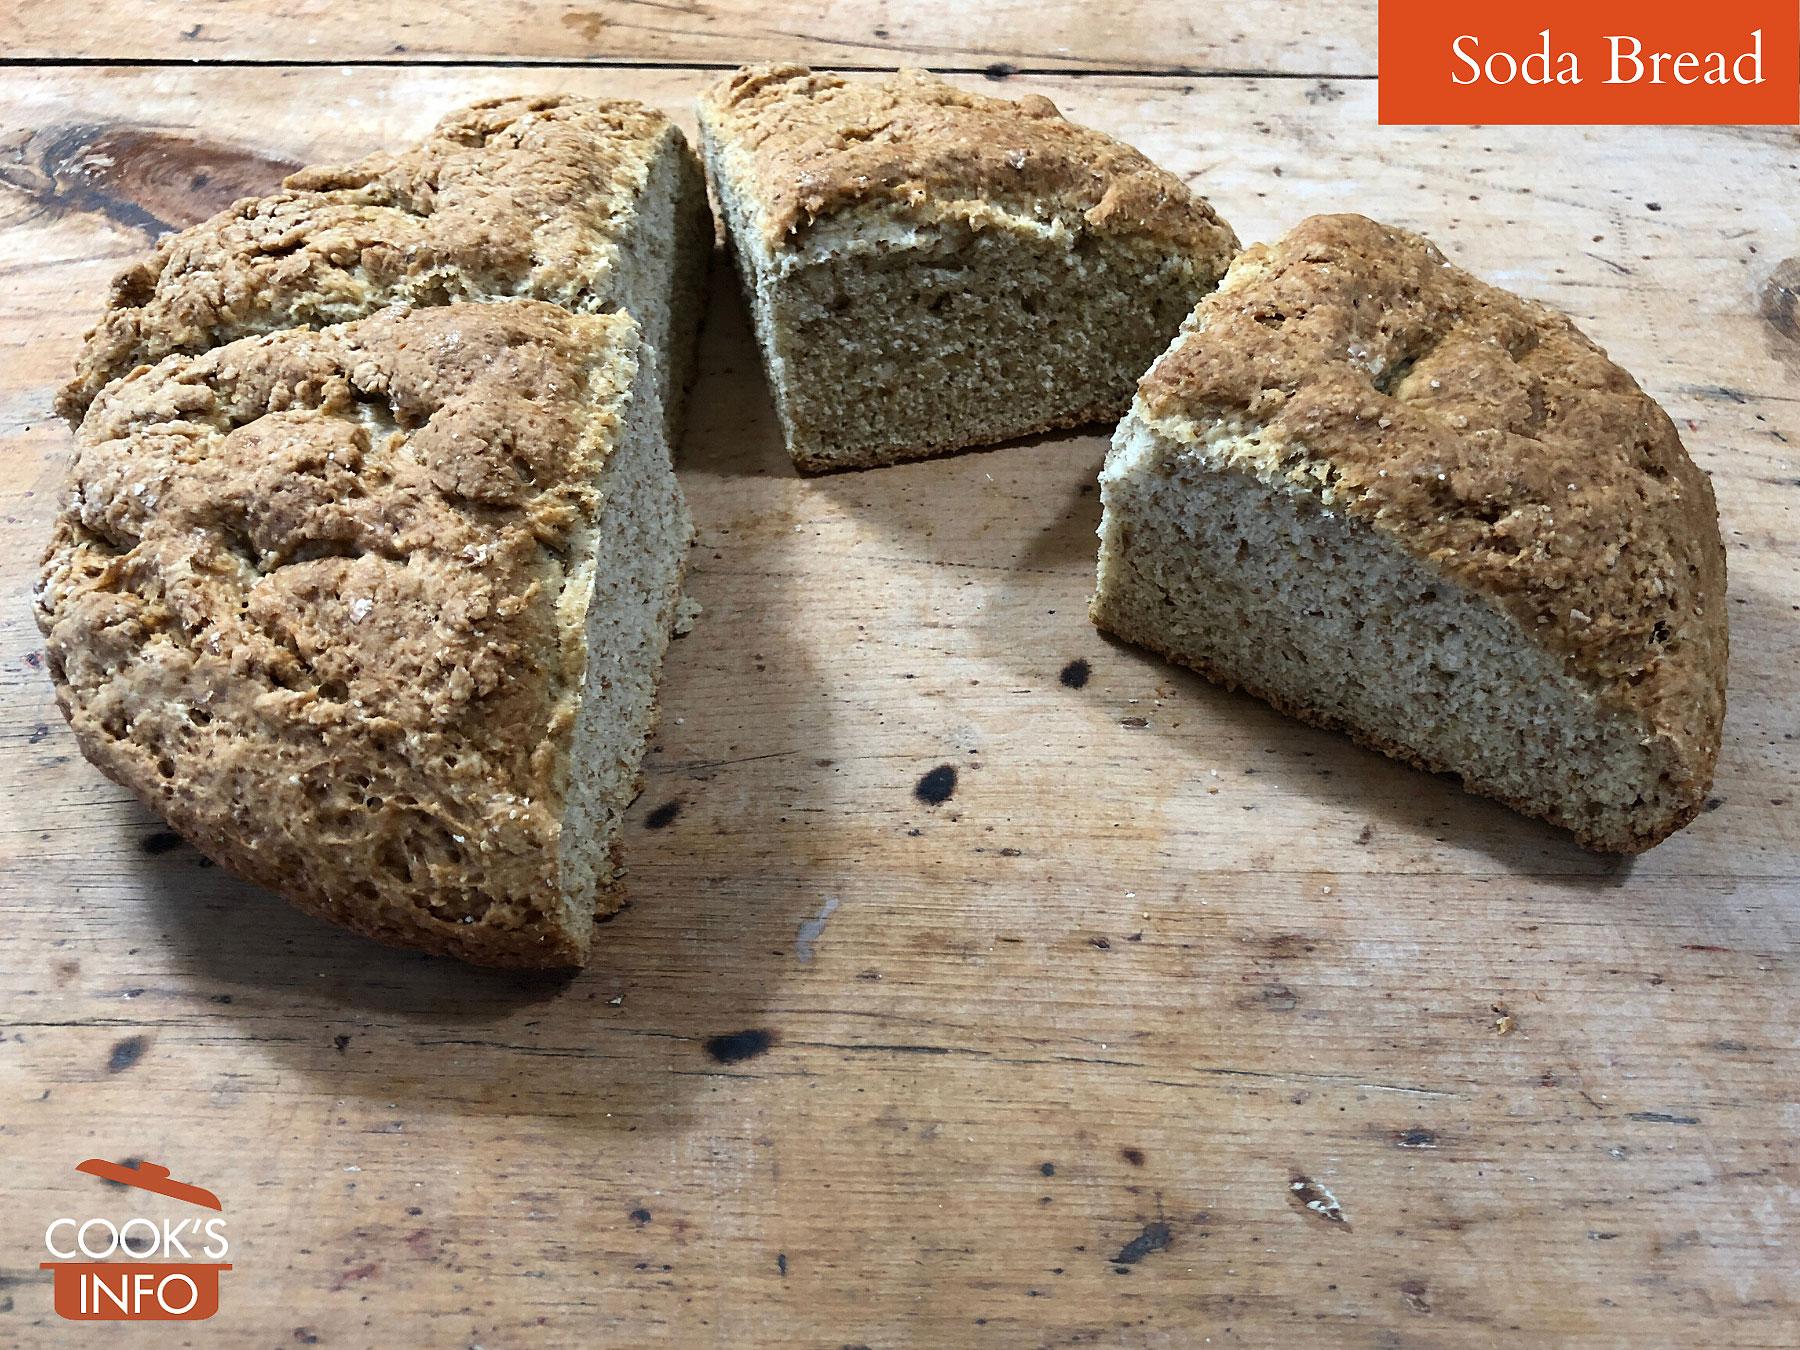 Loaf of soda bread, sliced